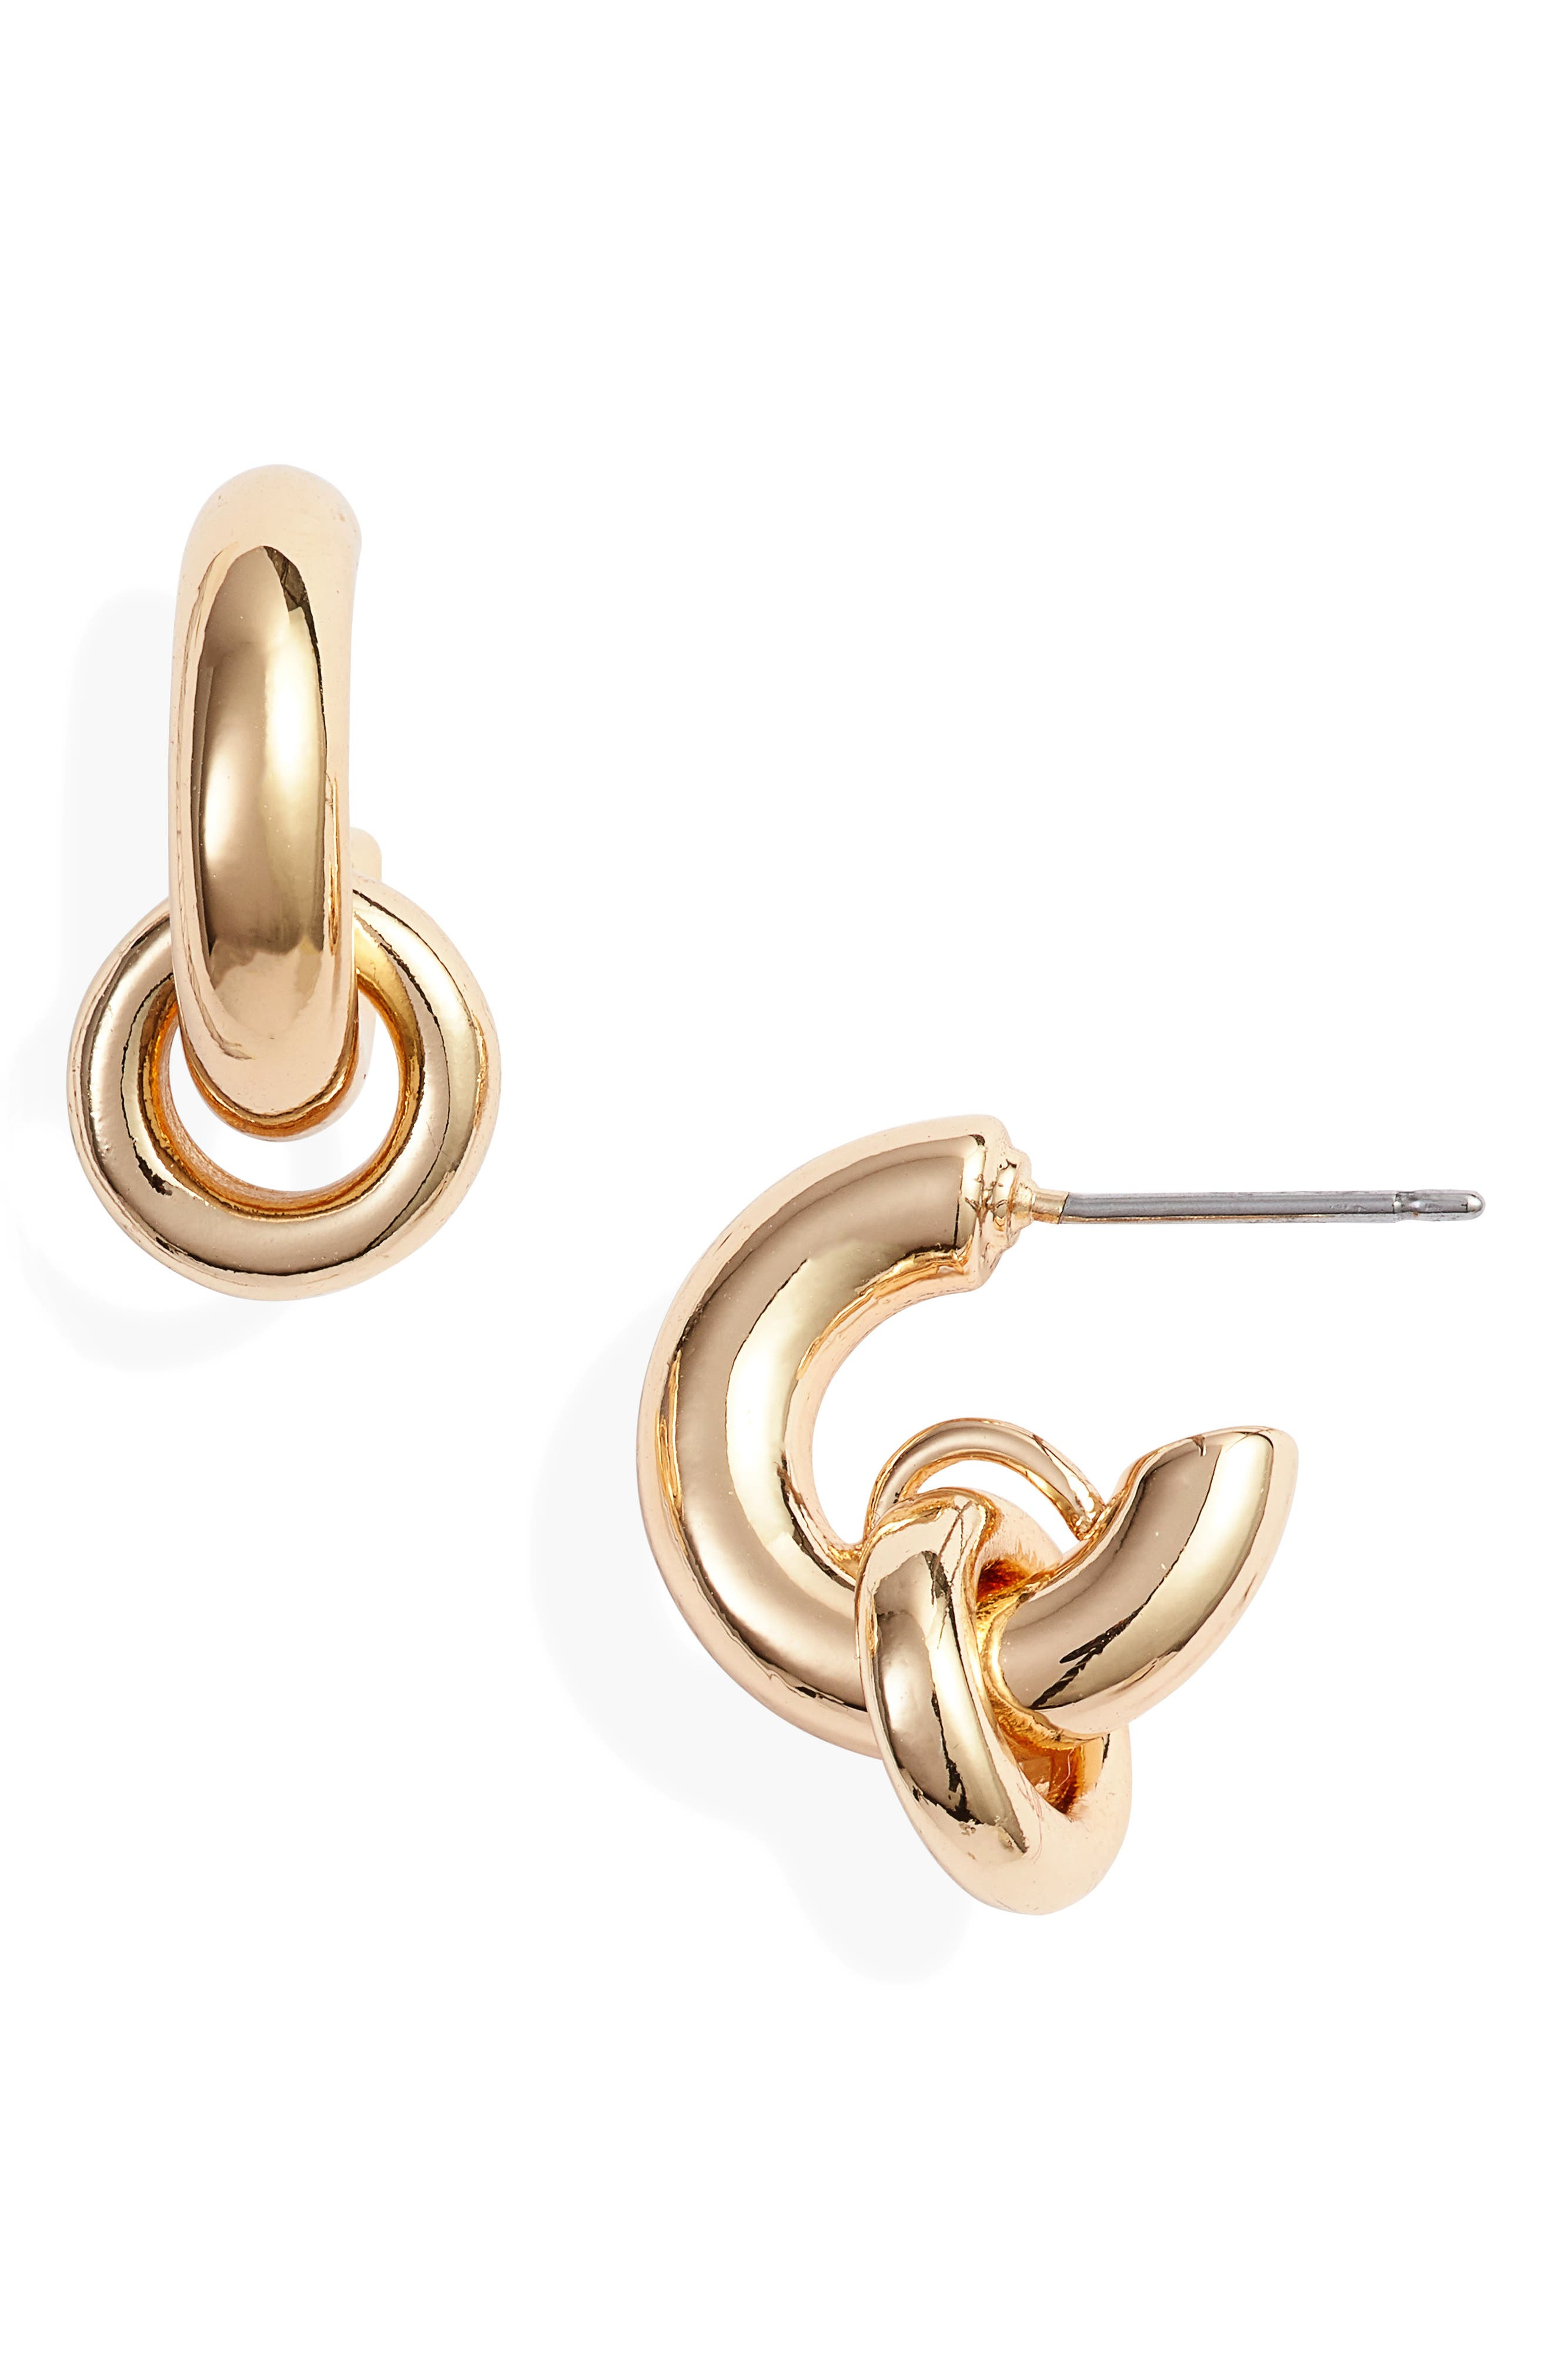 TREASURE & BOND, Huggie Hoop Earrings, Main thumbnail 1, color, 710